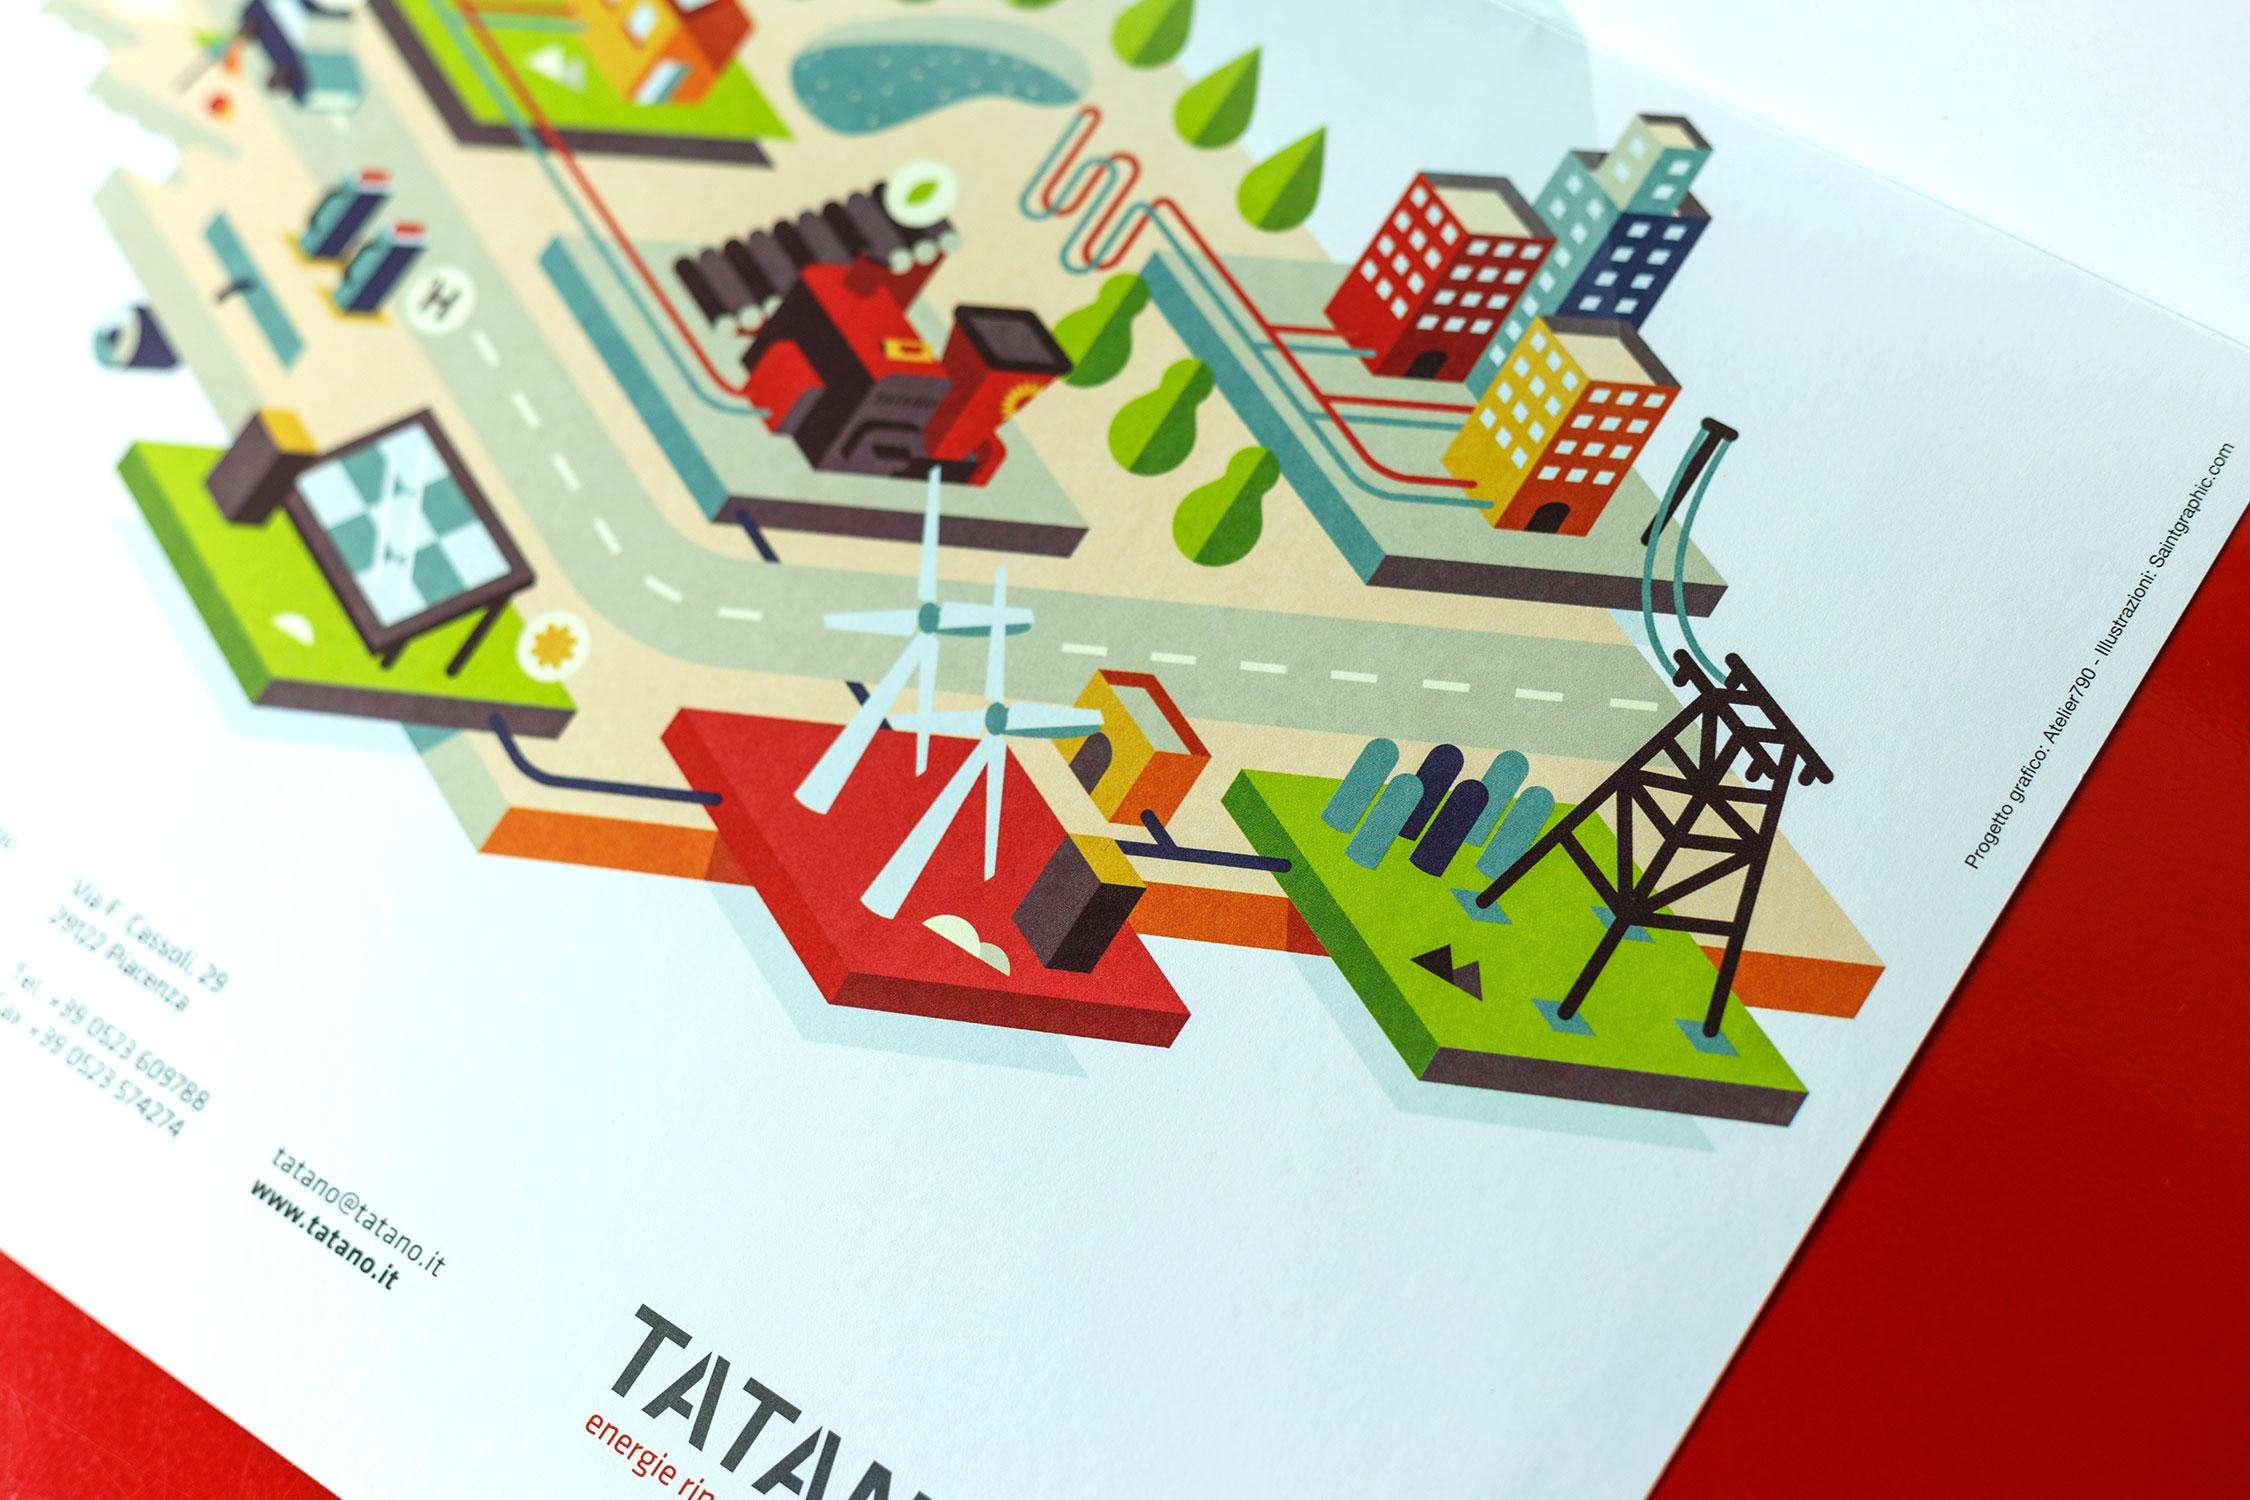 tatano_atelier790_6913